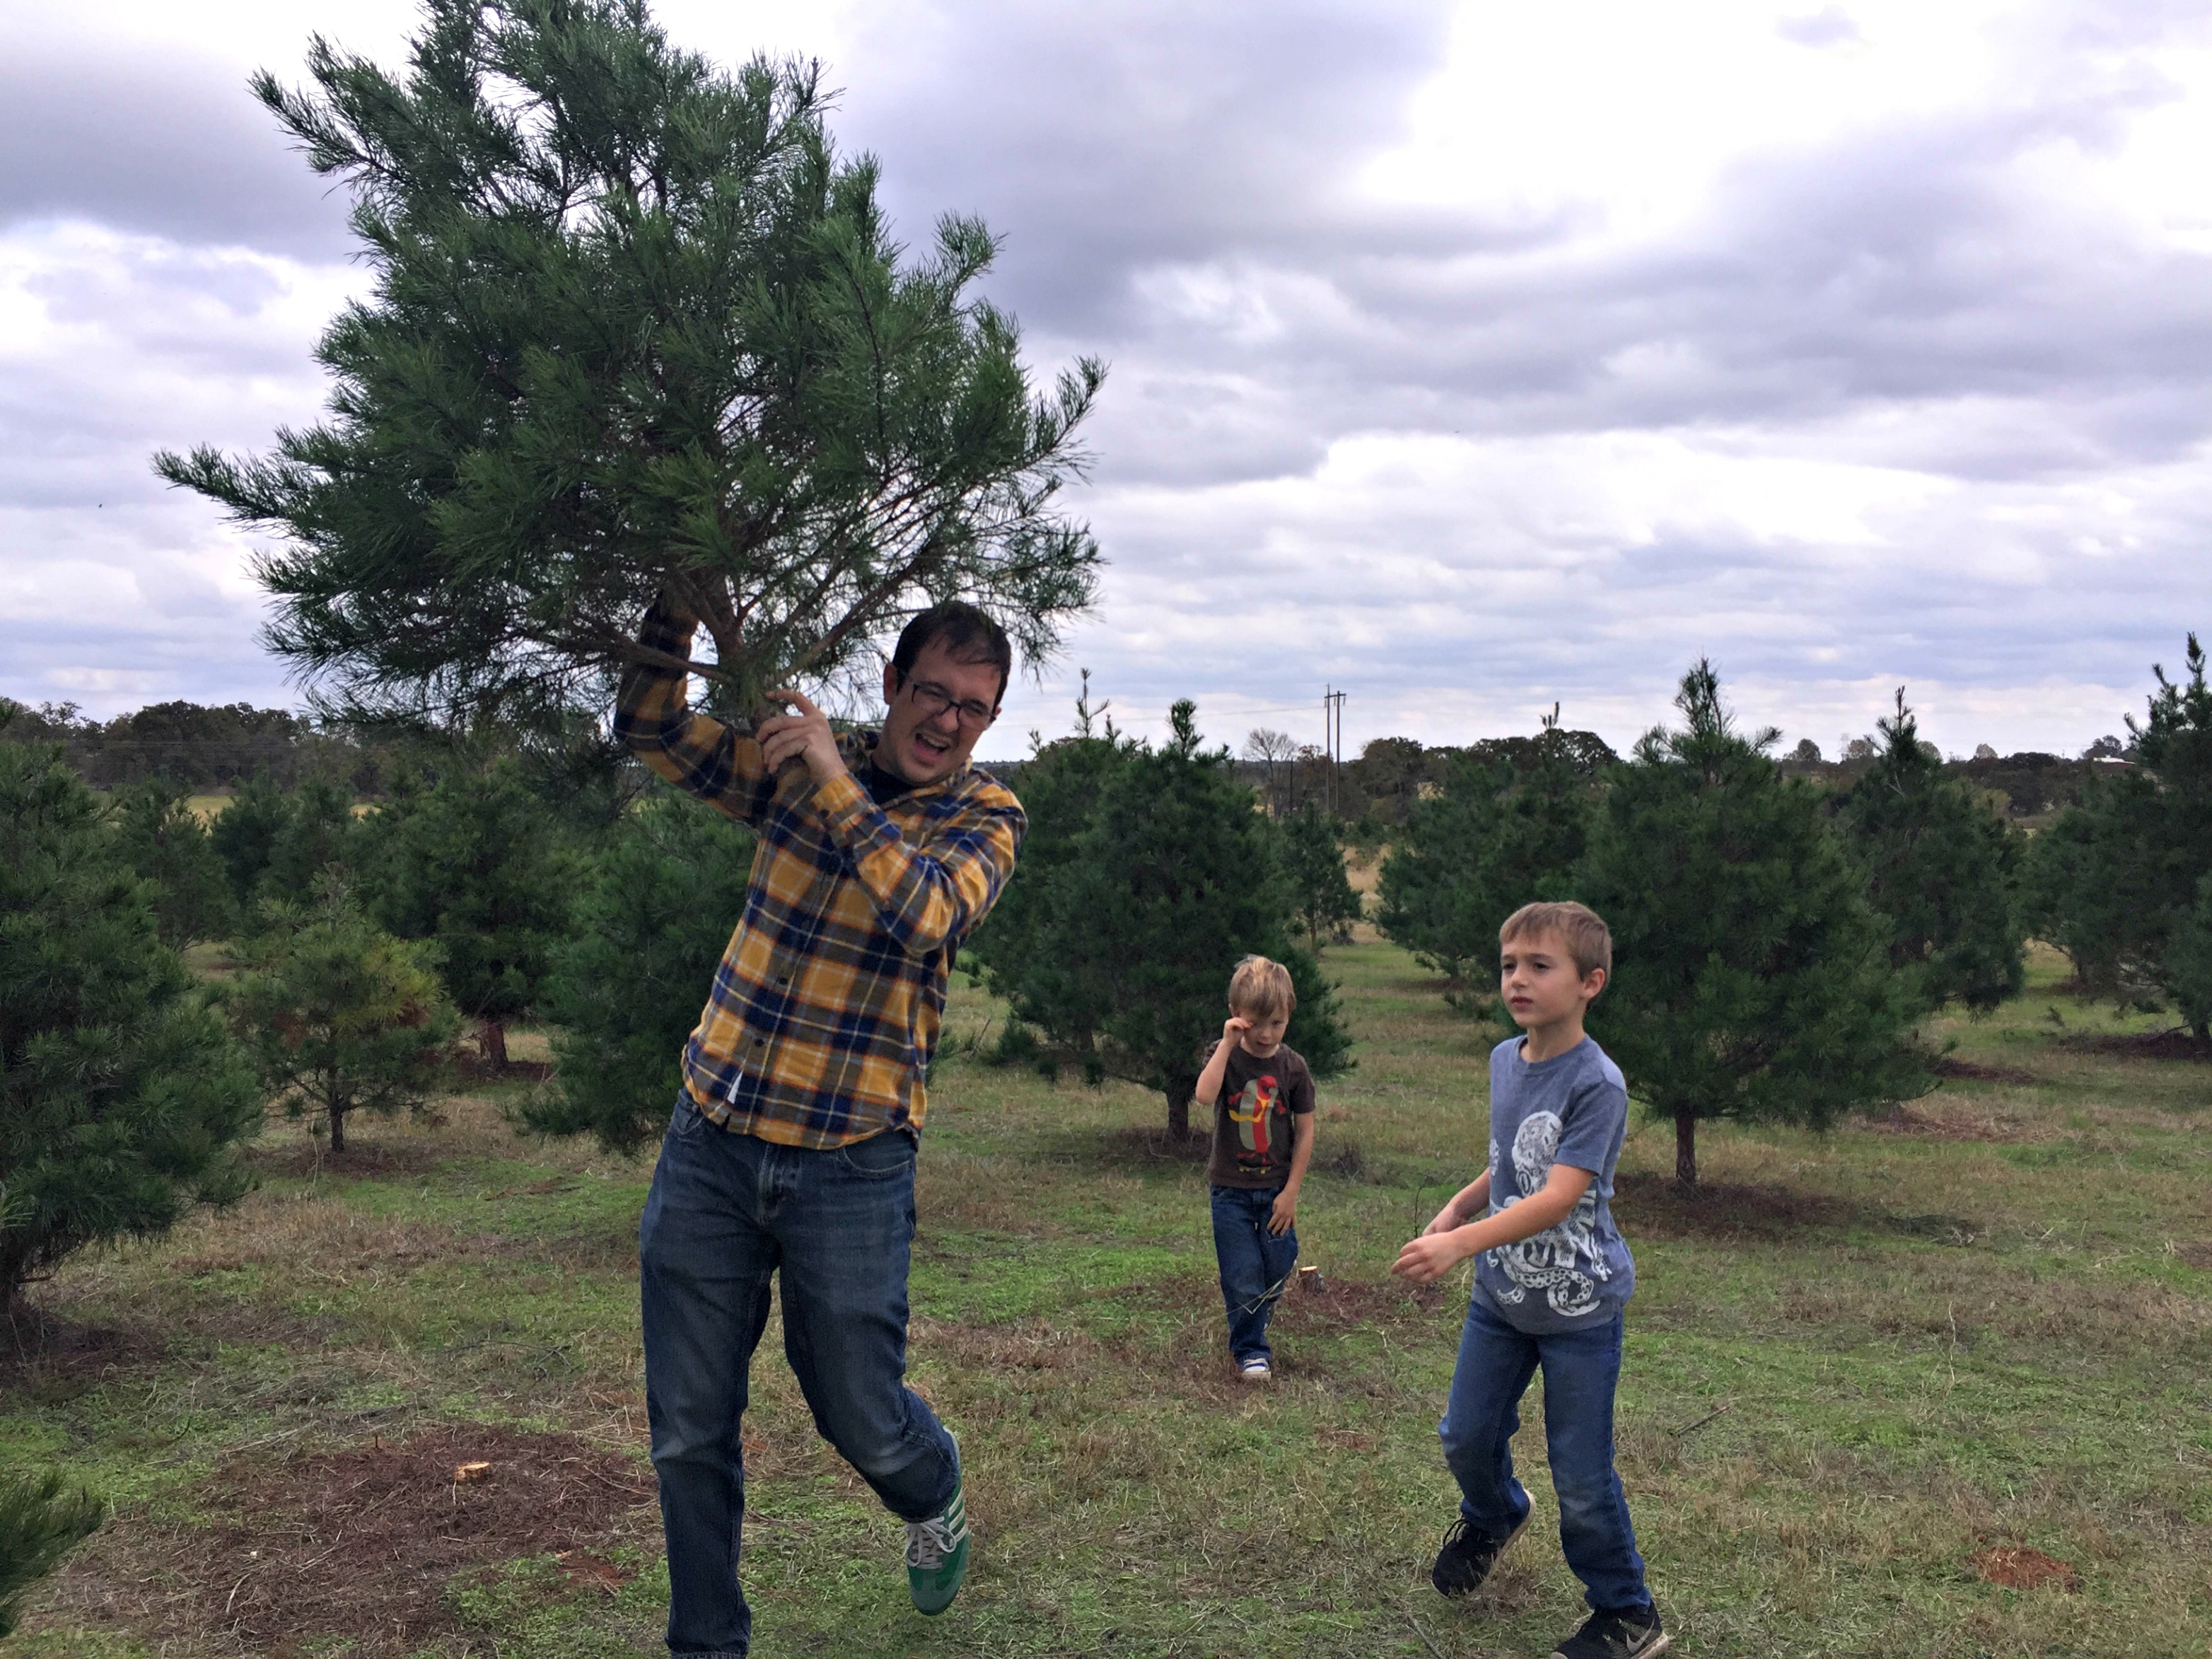 Elgin Christmas Tree Farm.Cut Your Own Christmas Tree At Elgin Christmas Tree Farm